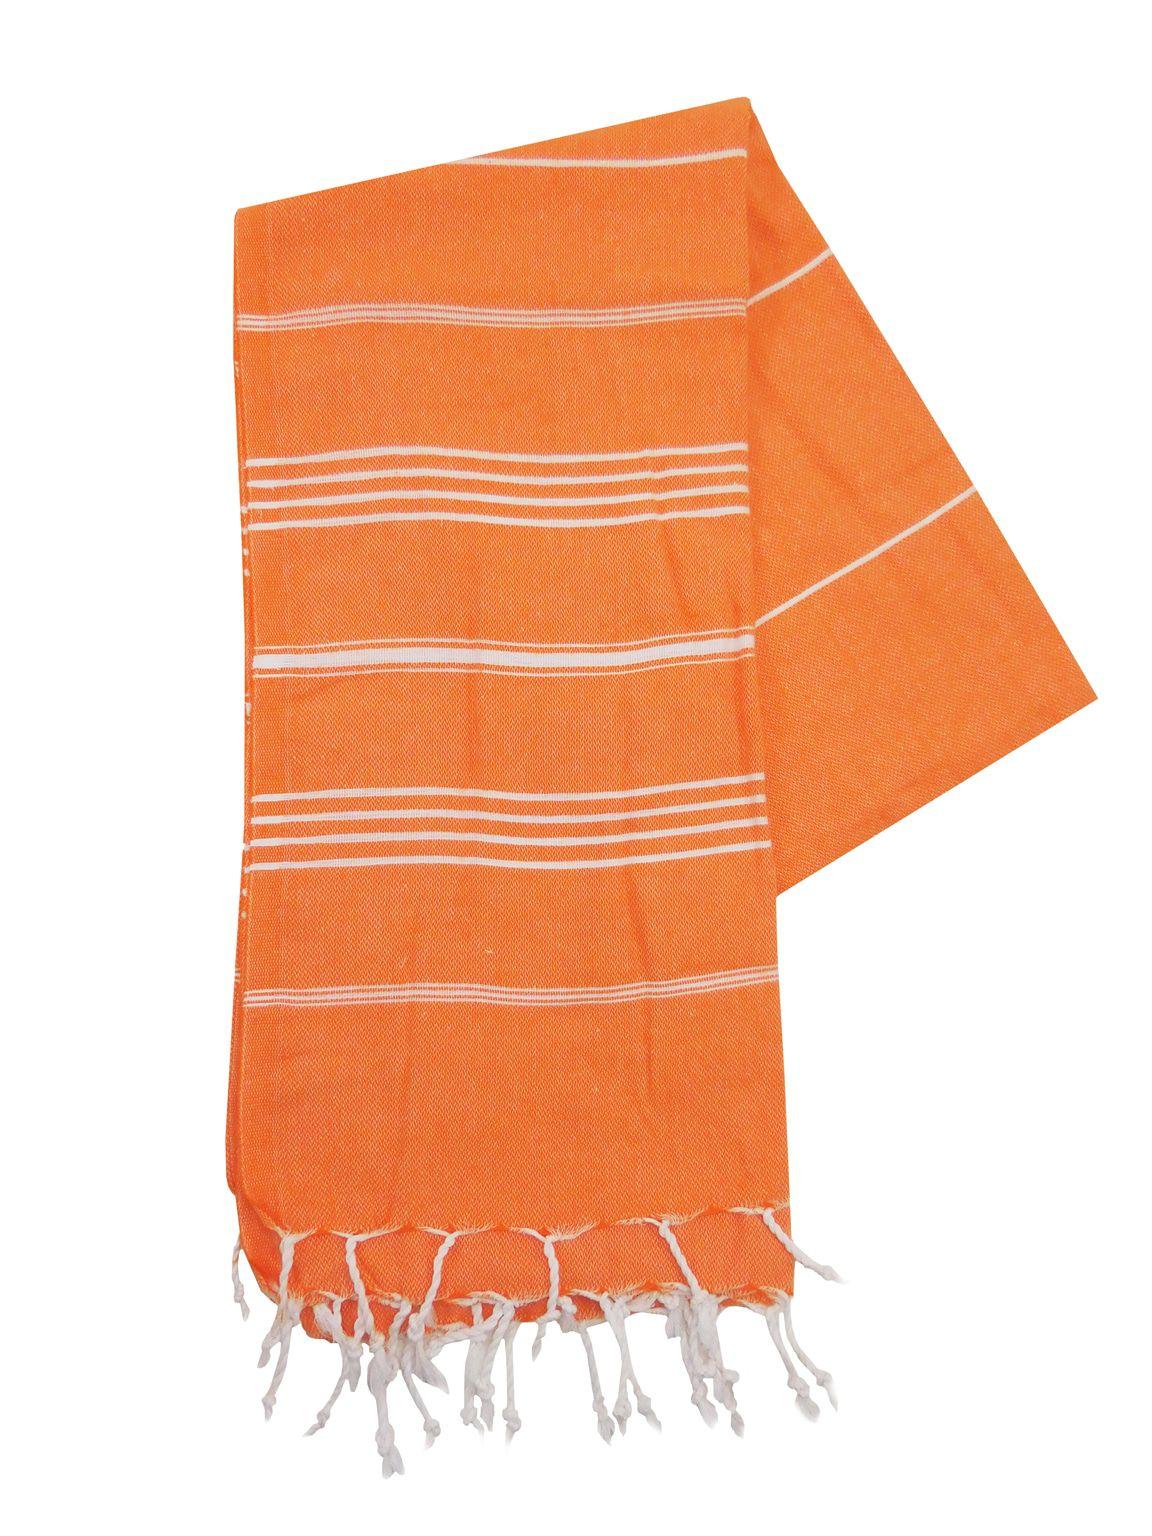 The One Towelling Hamamdoek Oranje Wit